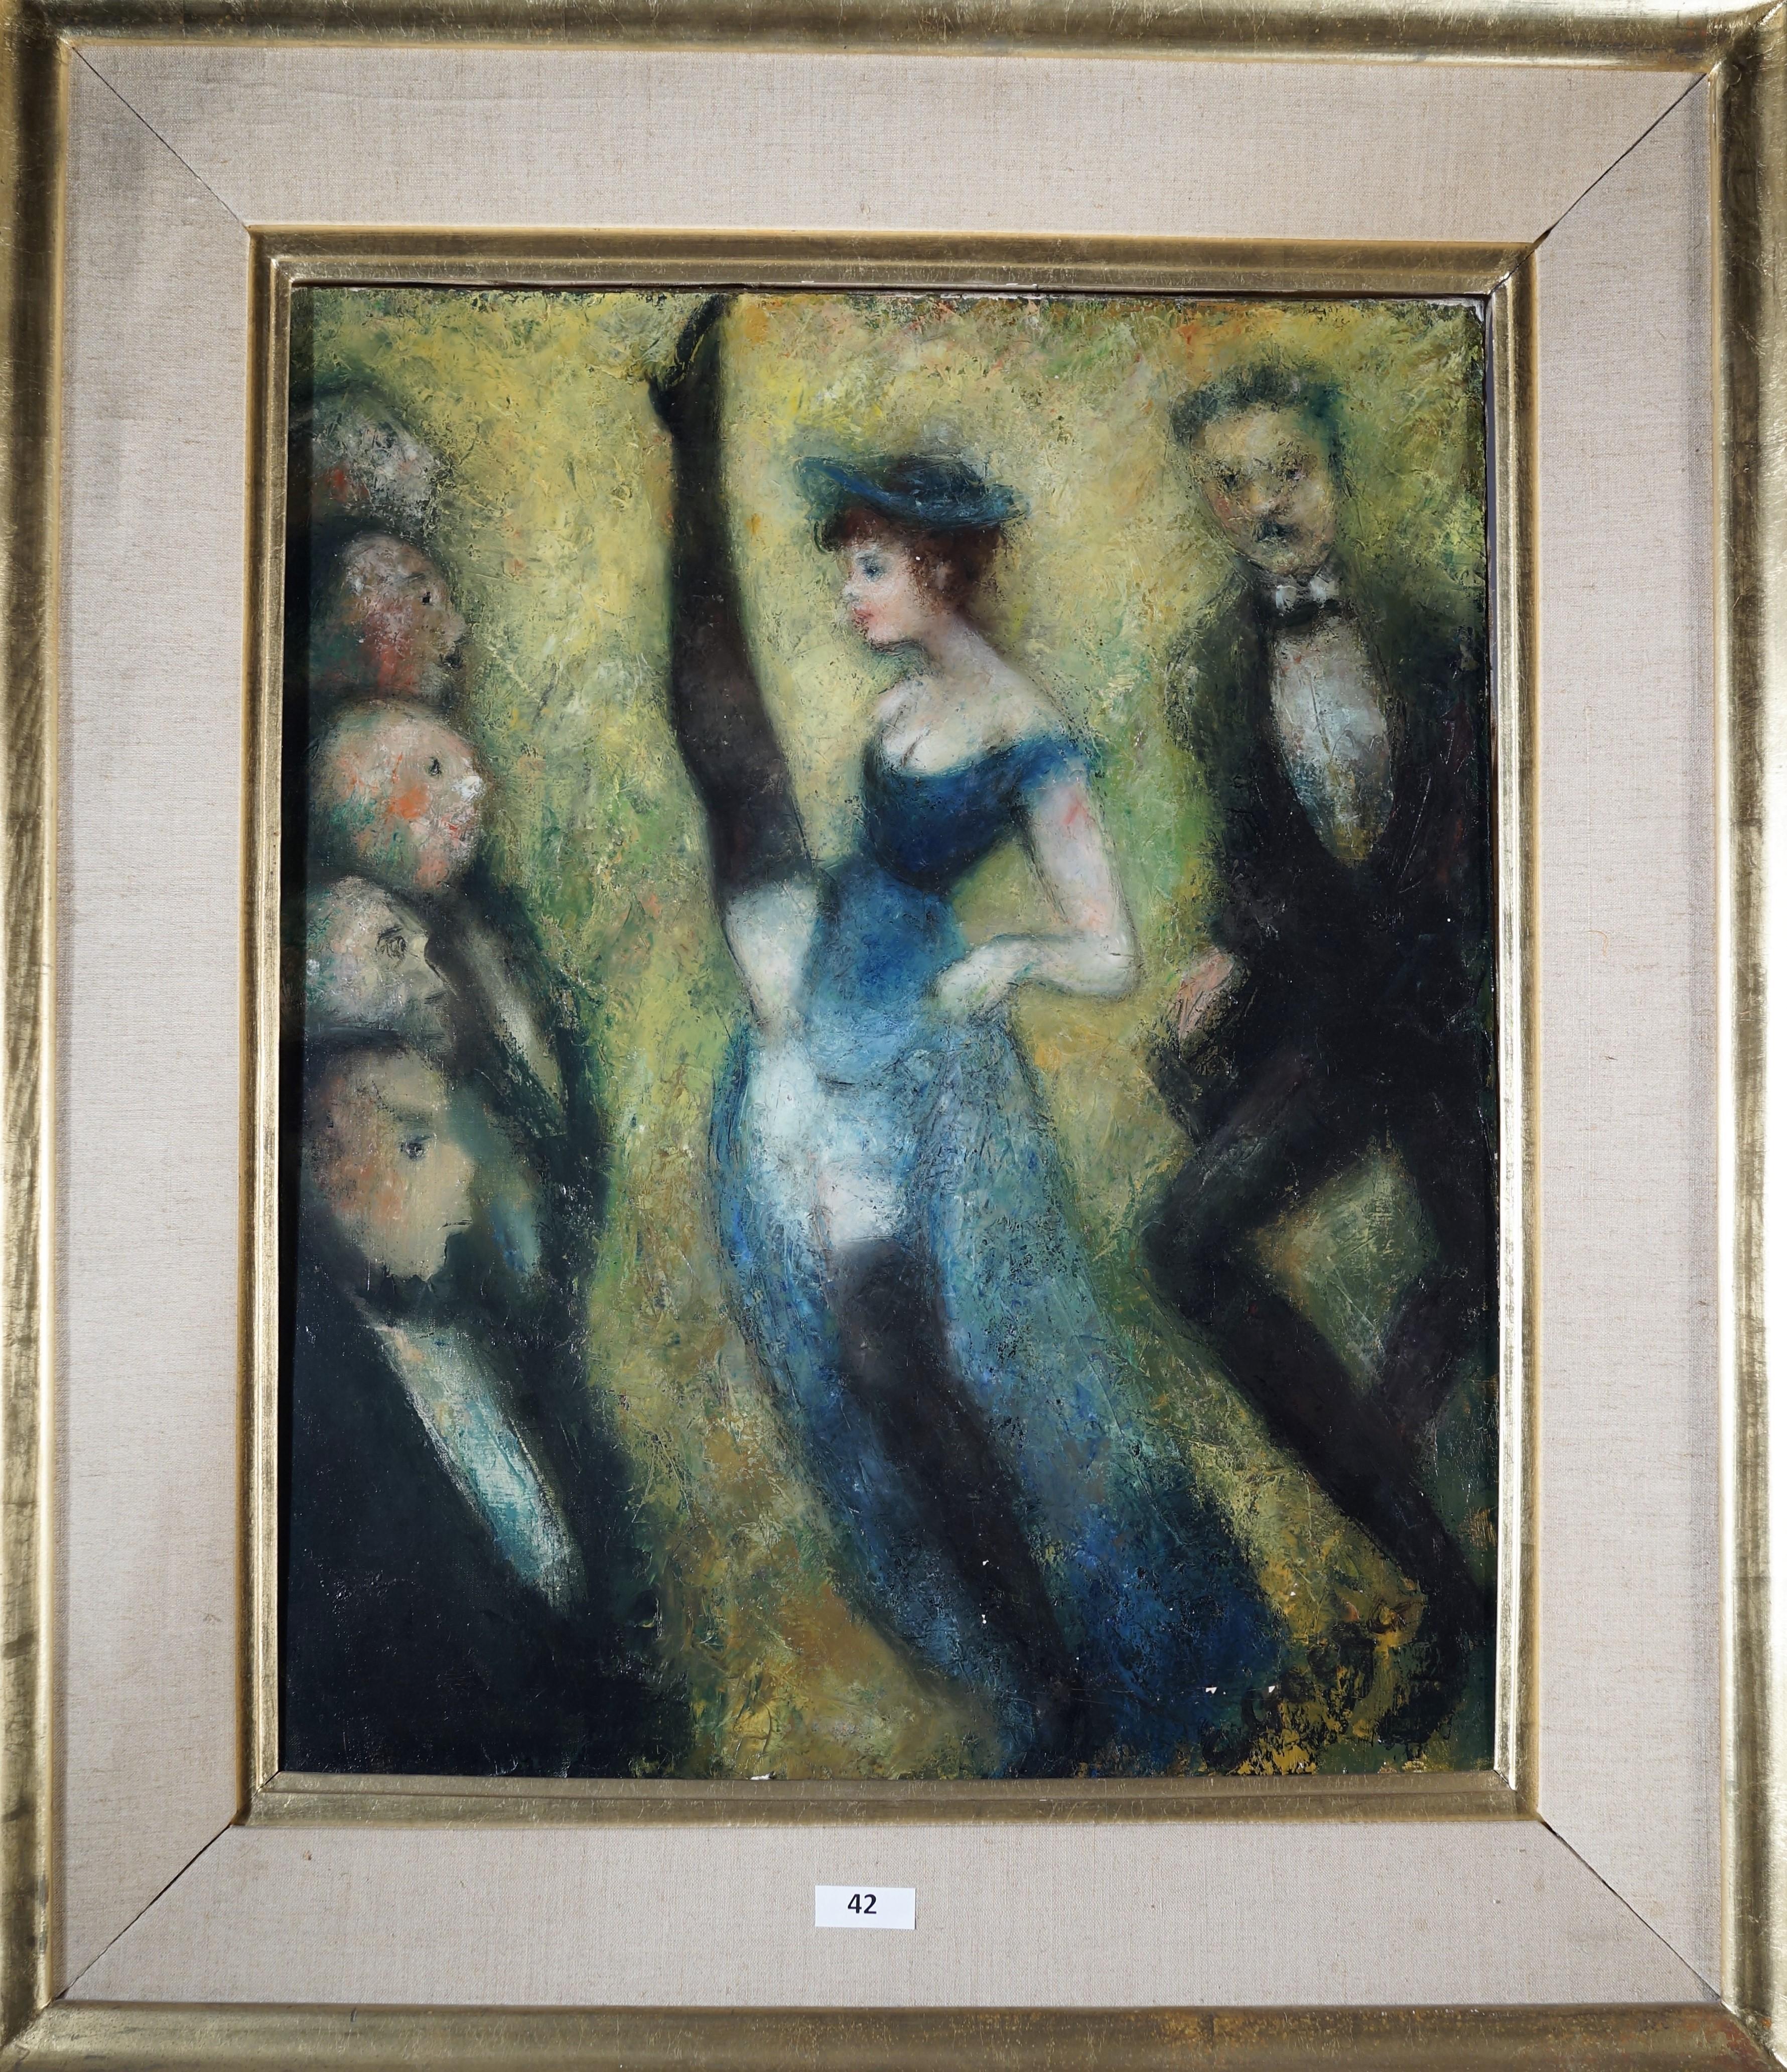 EDOUARD-JOSEPH GOERG (1893-1969) - La French-Cancan, Öl/Lwd., signiert und datiert, 1952